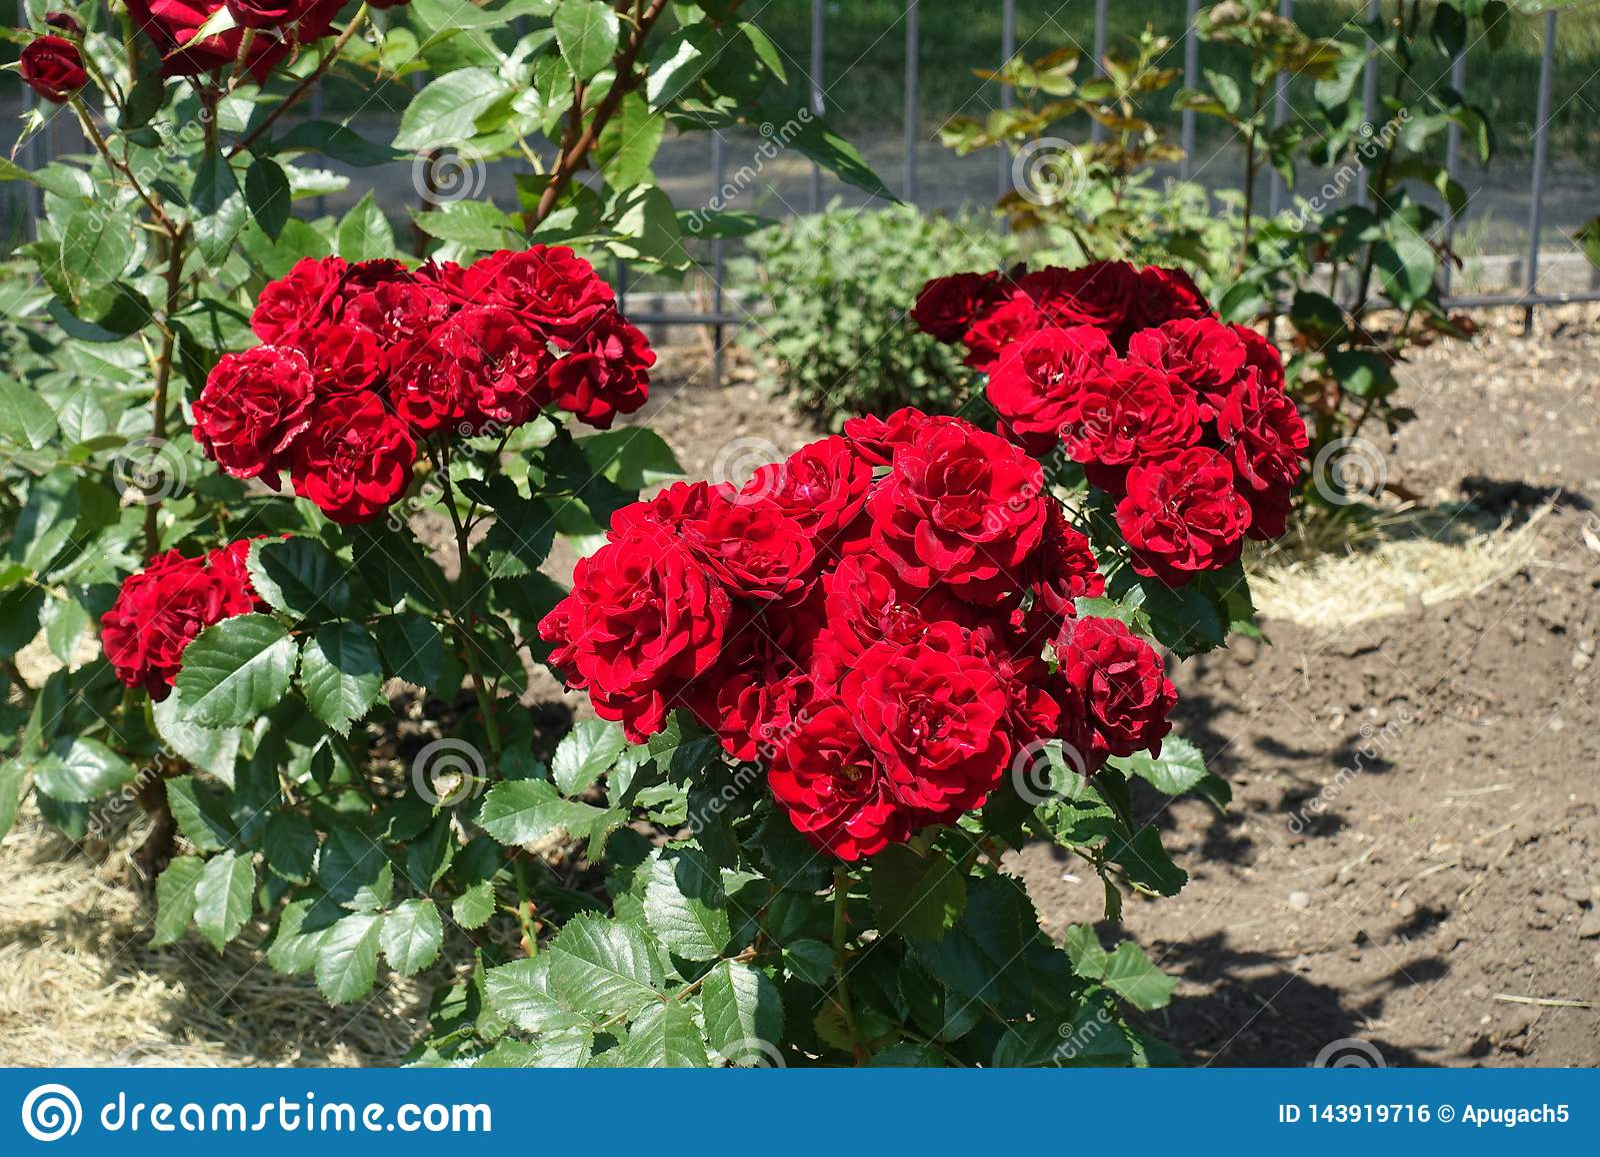 Racimos de flores rojas de rosas